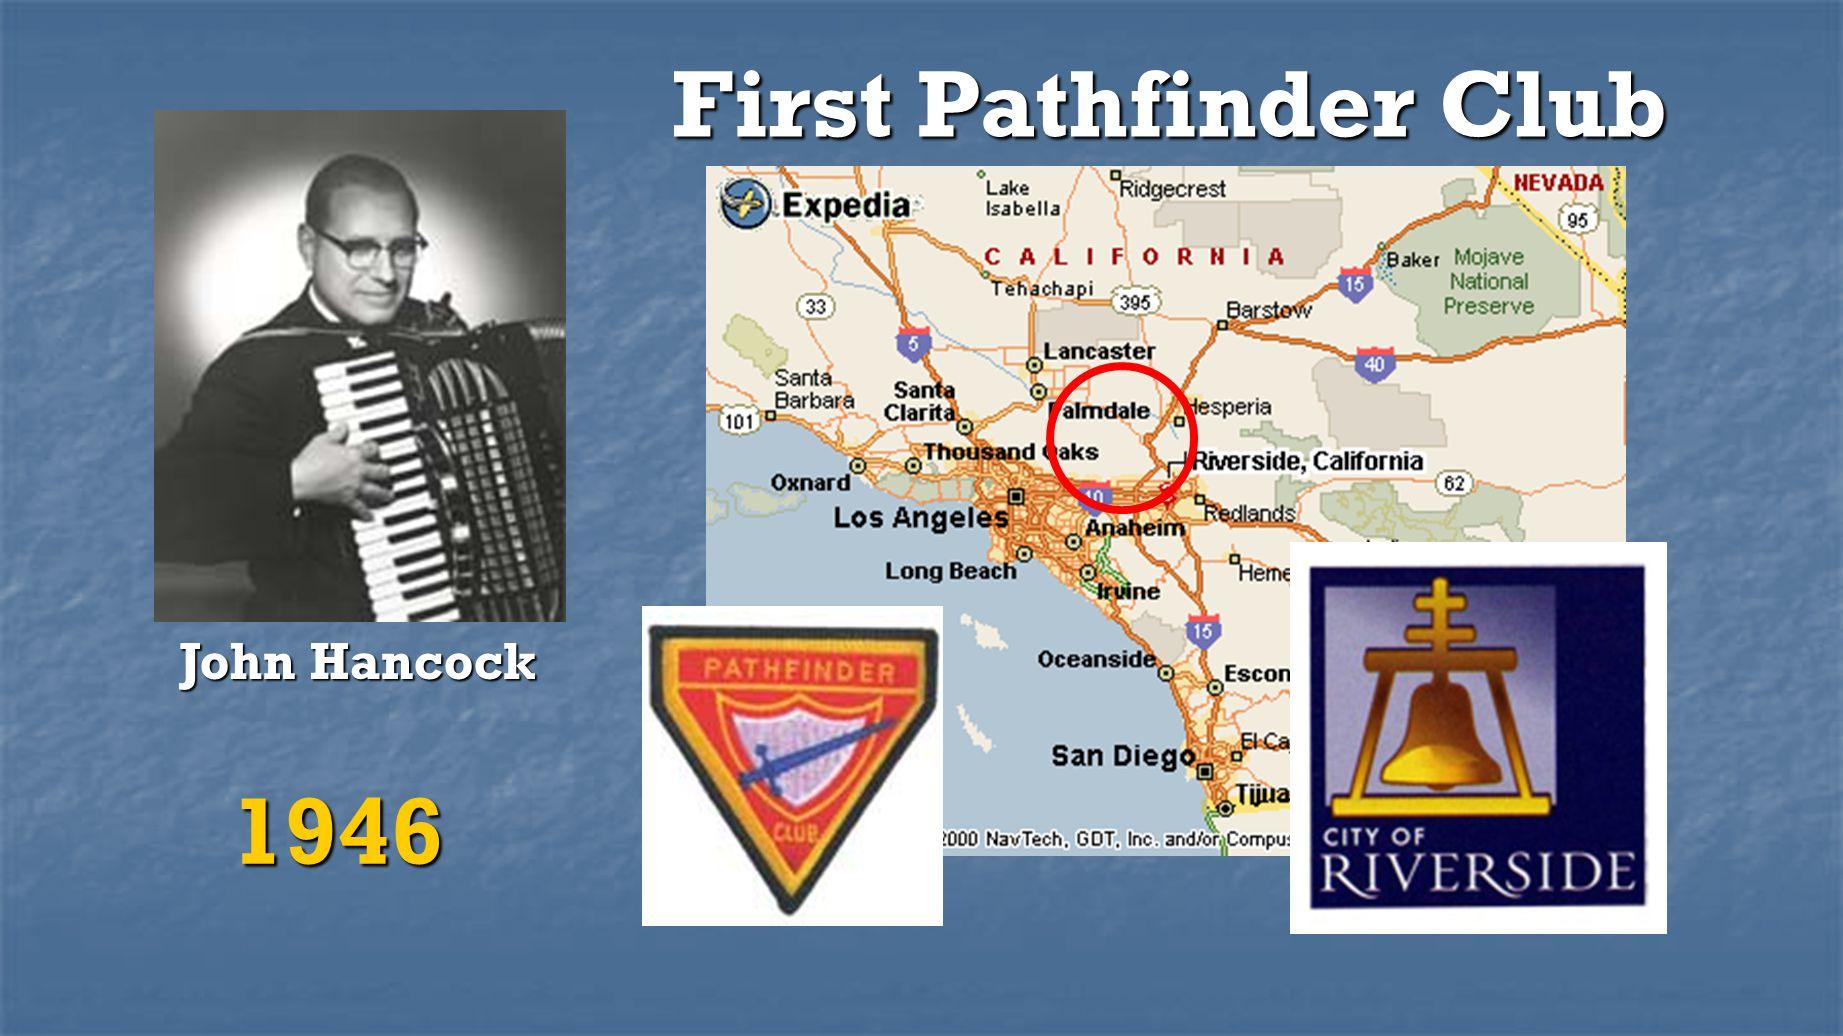 First Pathfinder Club John Hancock 1946